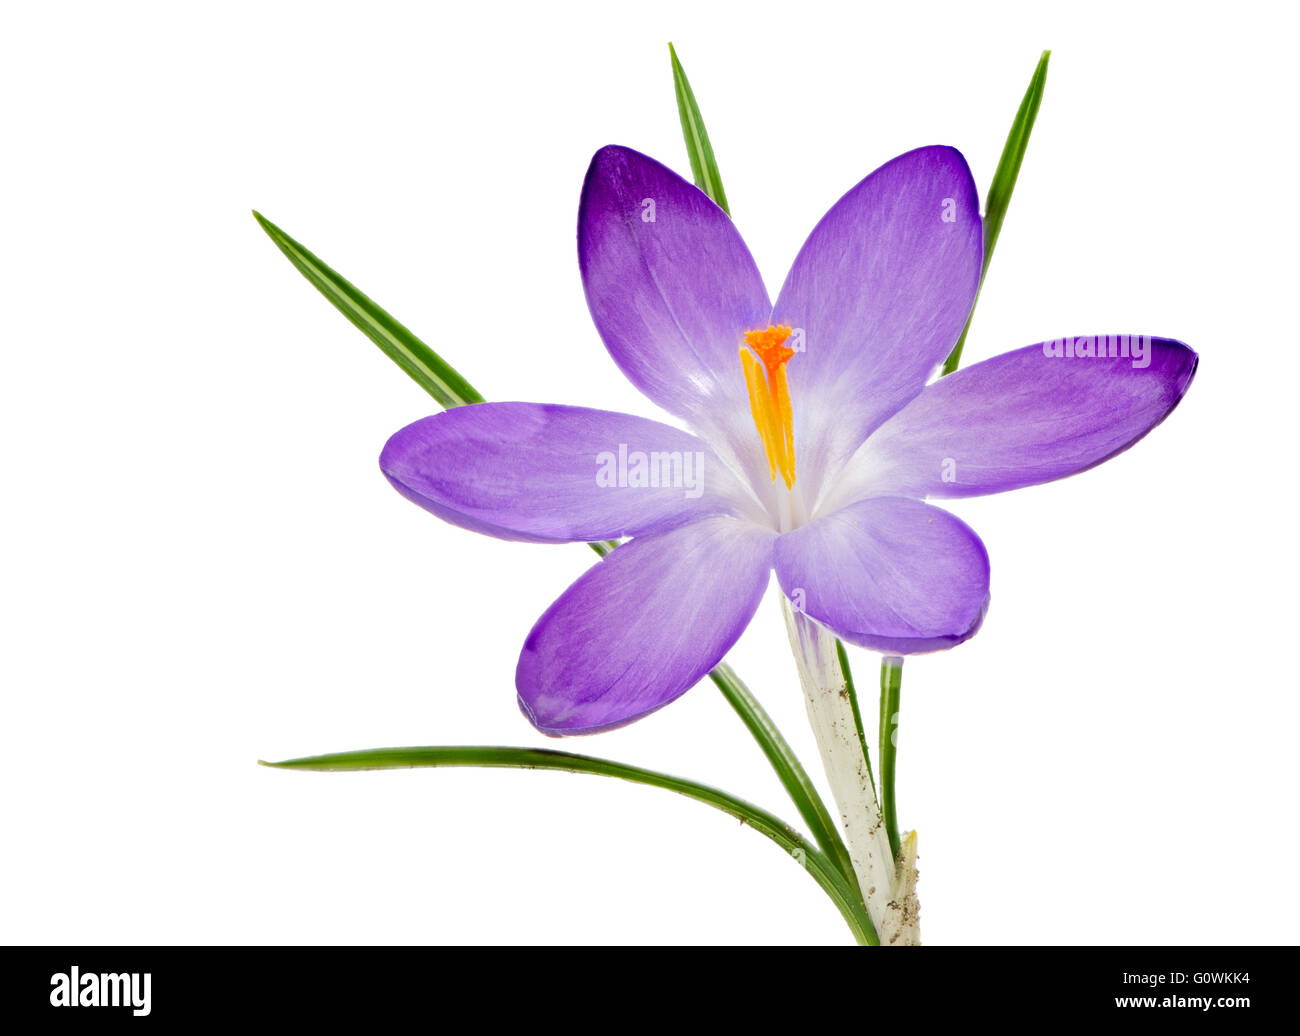 Macro of an isolated purple crocus flower blossom Stock Photo